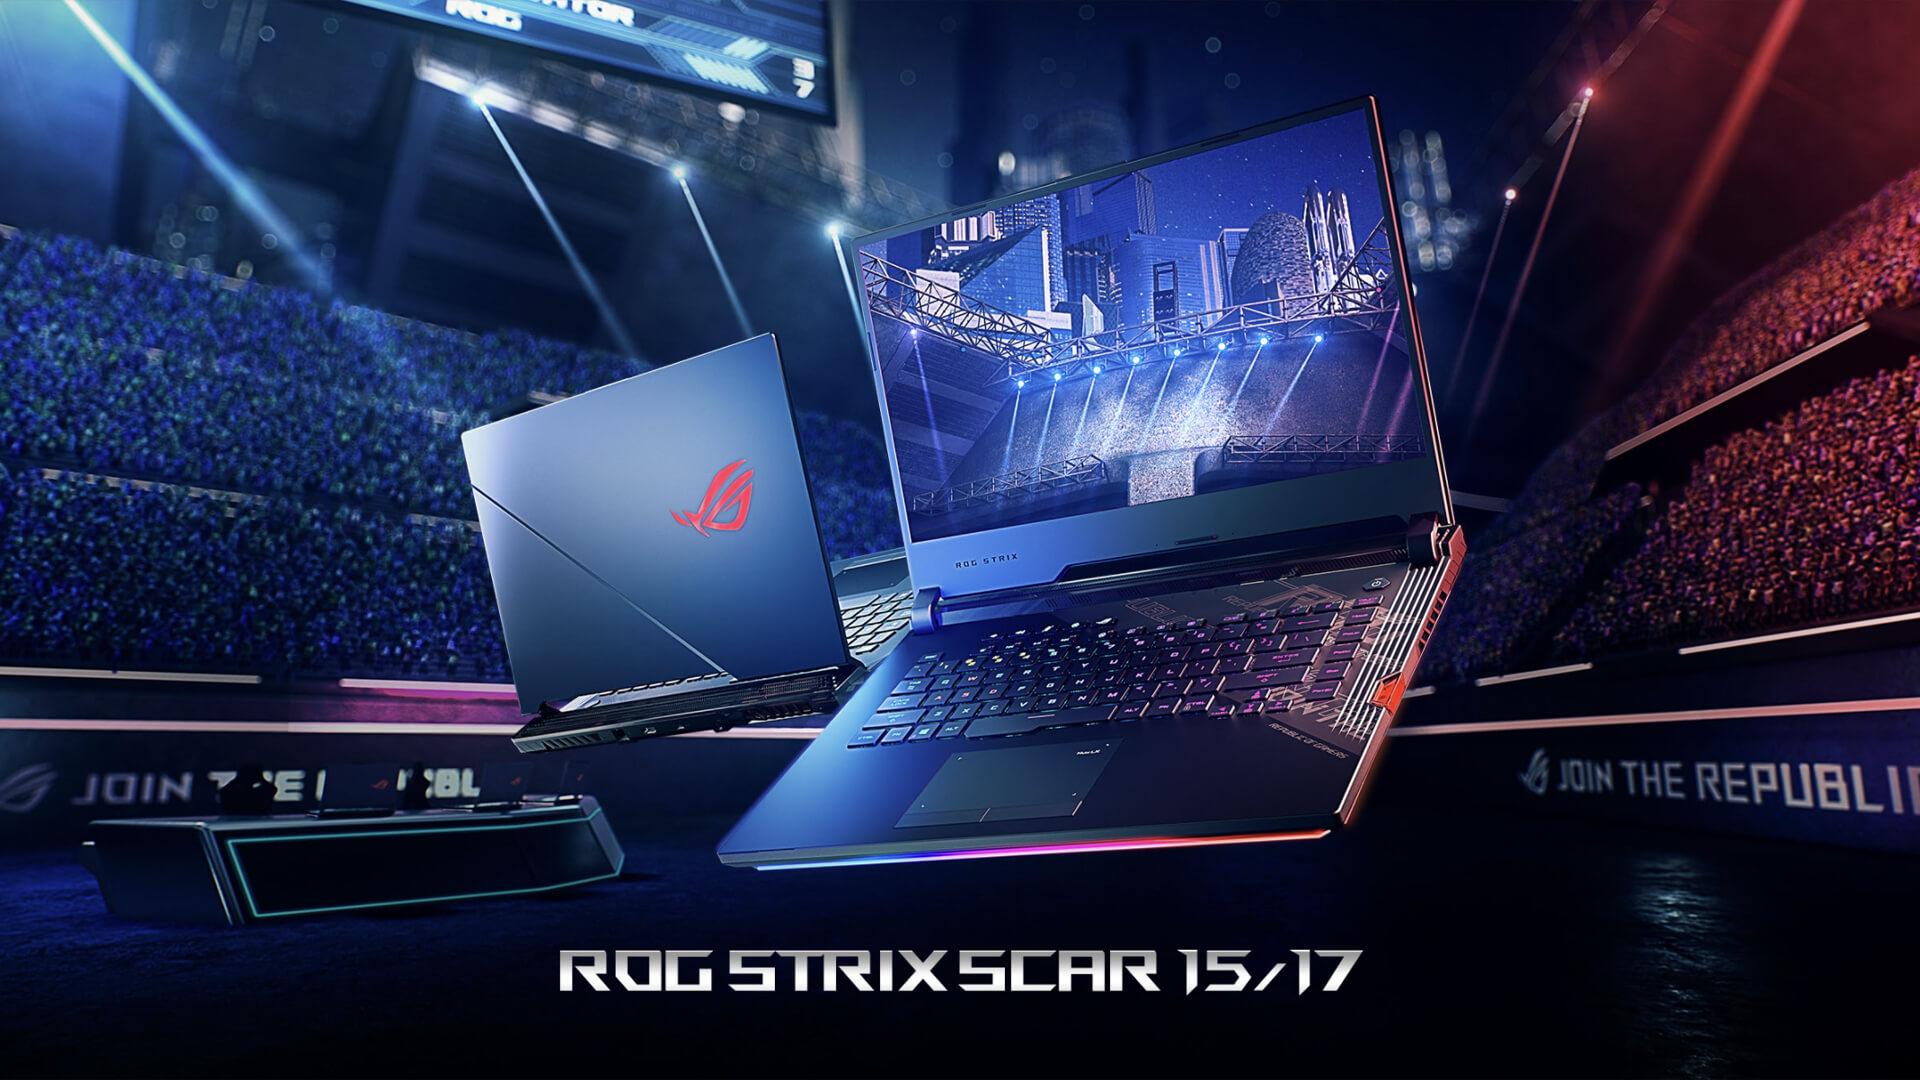 ASUS ROG Strix SCAR 15